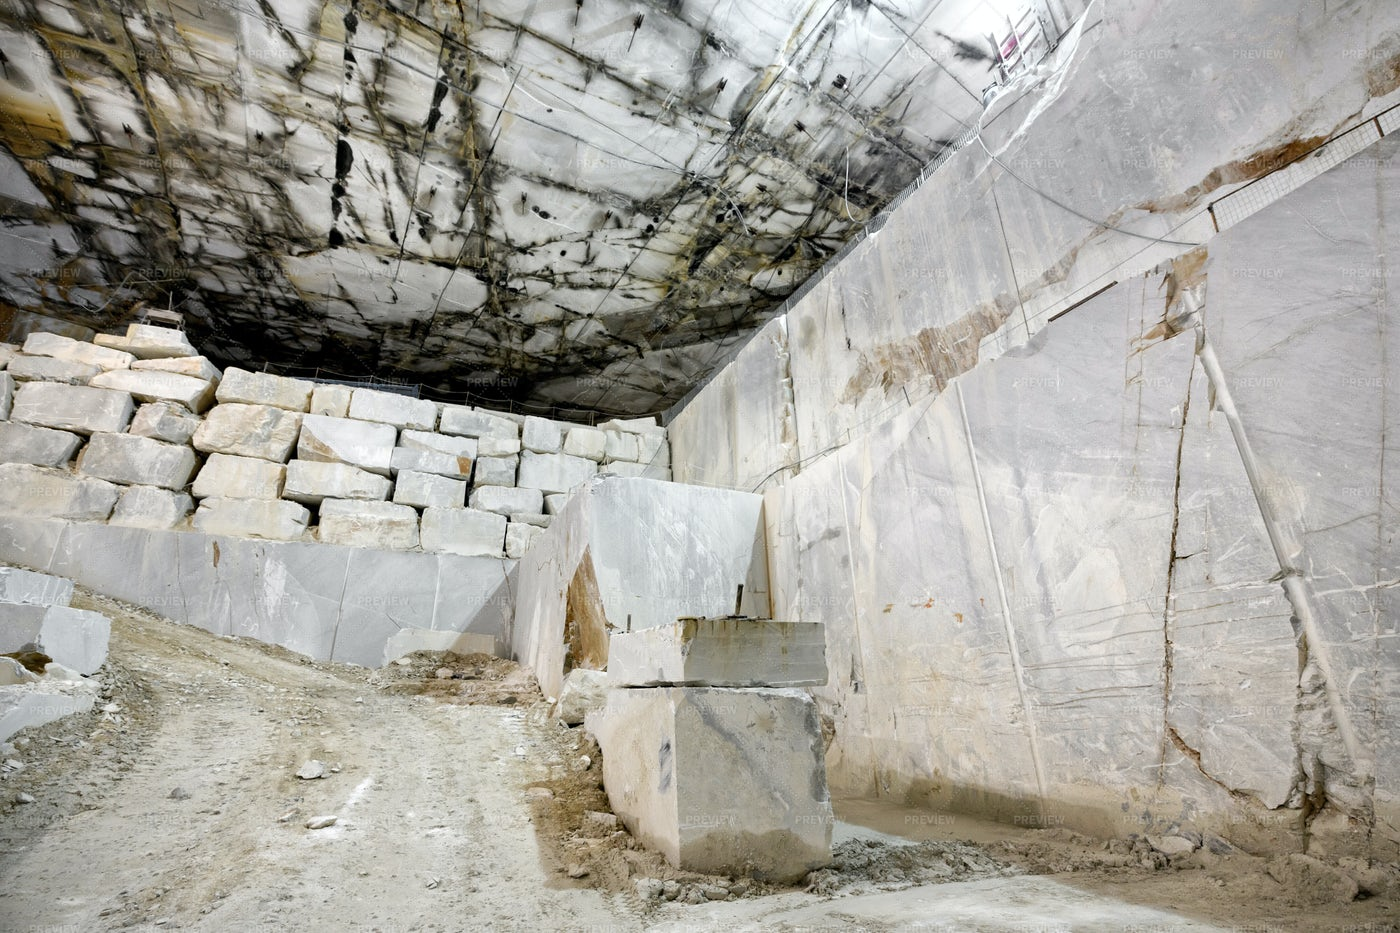 Marble Mine: Stock Photos